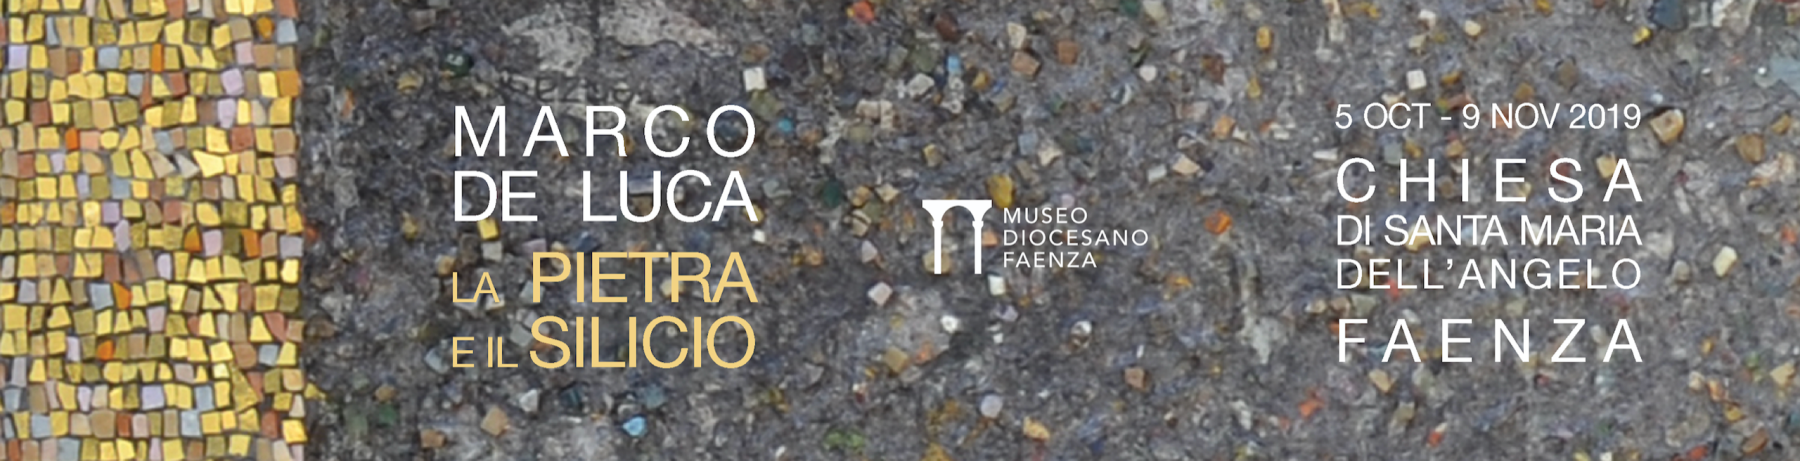 marco del luca Pietra e Silicio Faenza